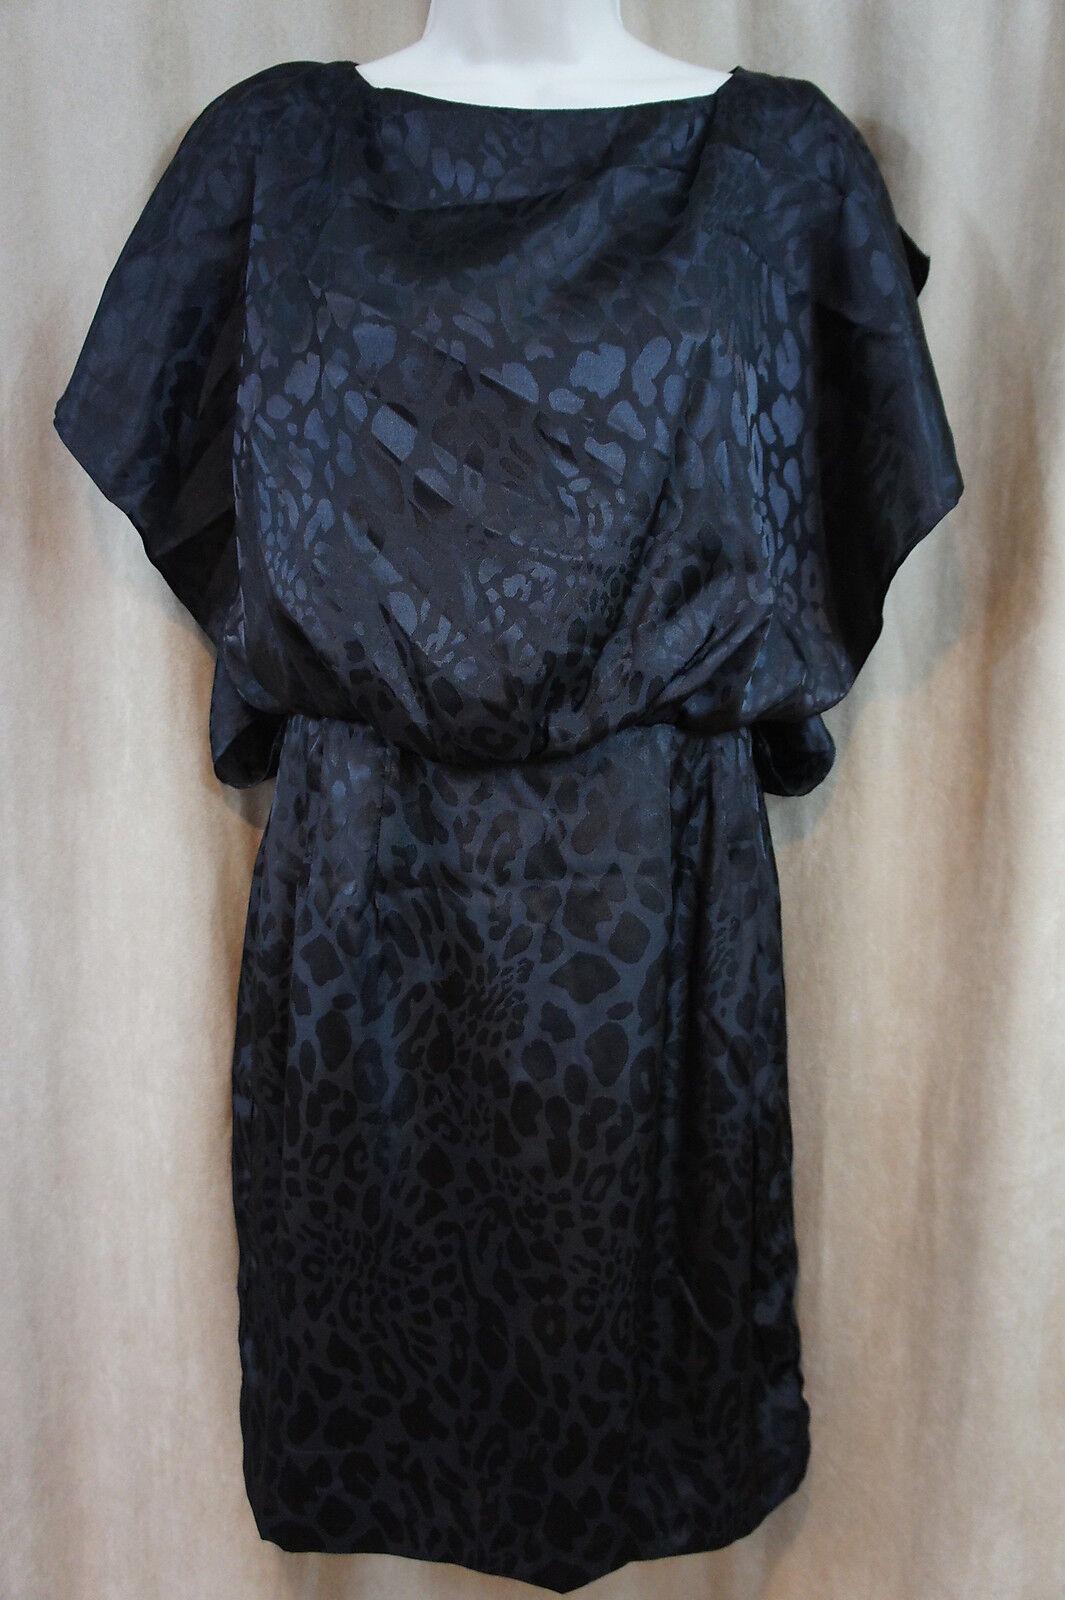 Jessica Simpson Dress Sz 6 schwarz Animal Print Dolman Sleeve Slit Cocktail Party